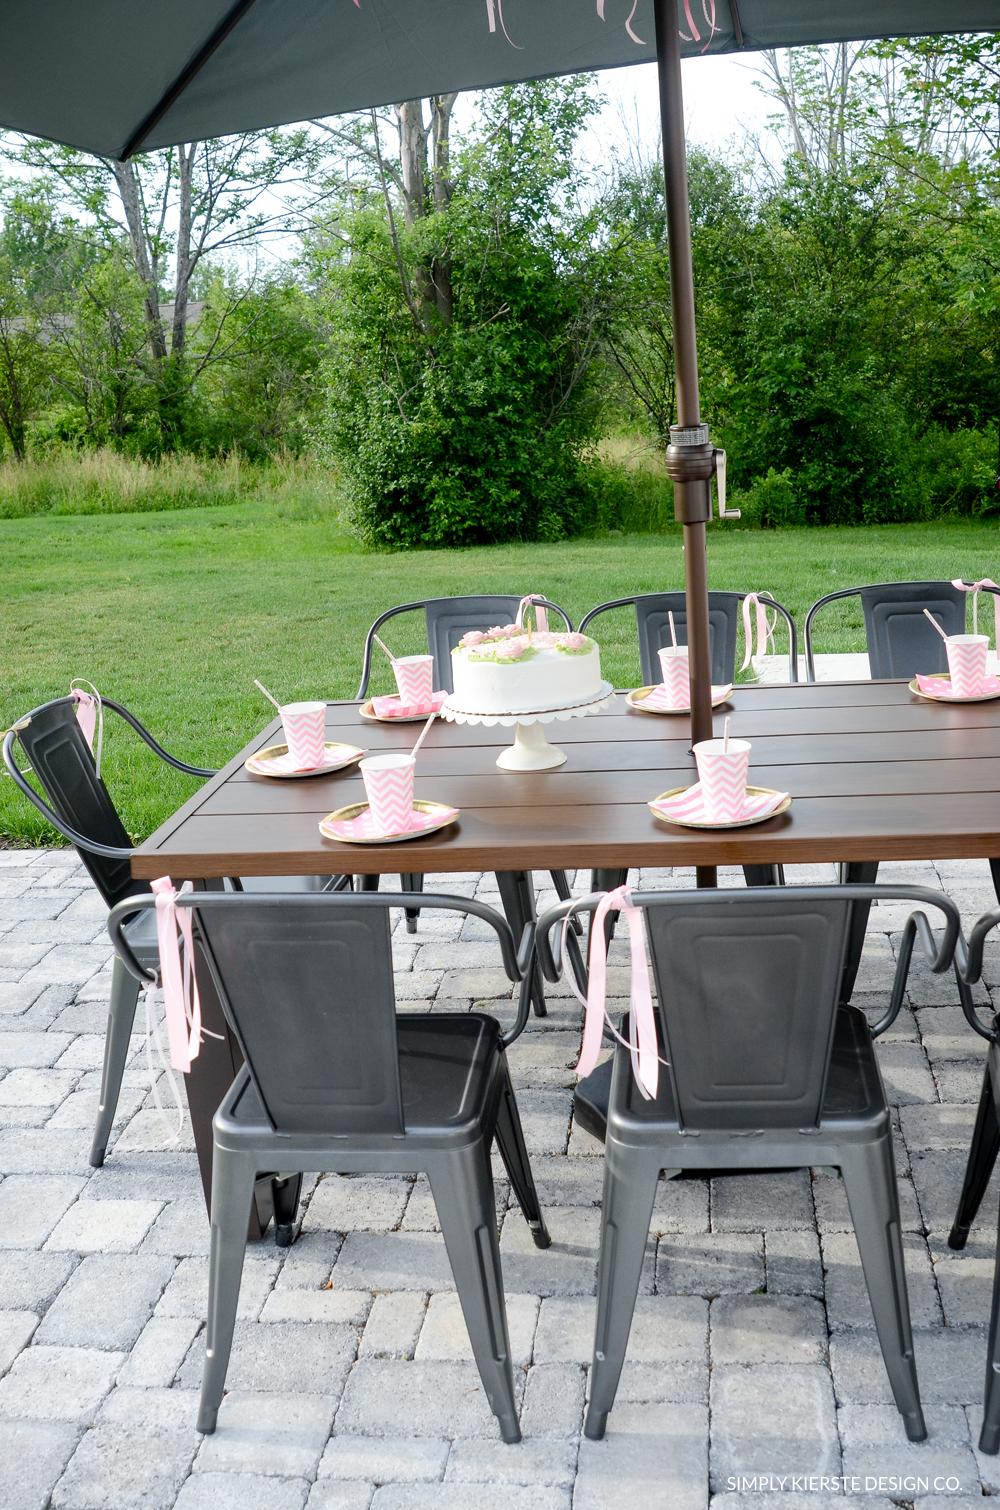 Outdoor Tween Girl Birthday Party For Under 100 Old Salt Farm